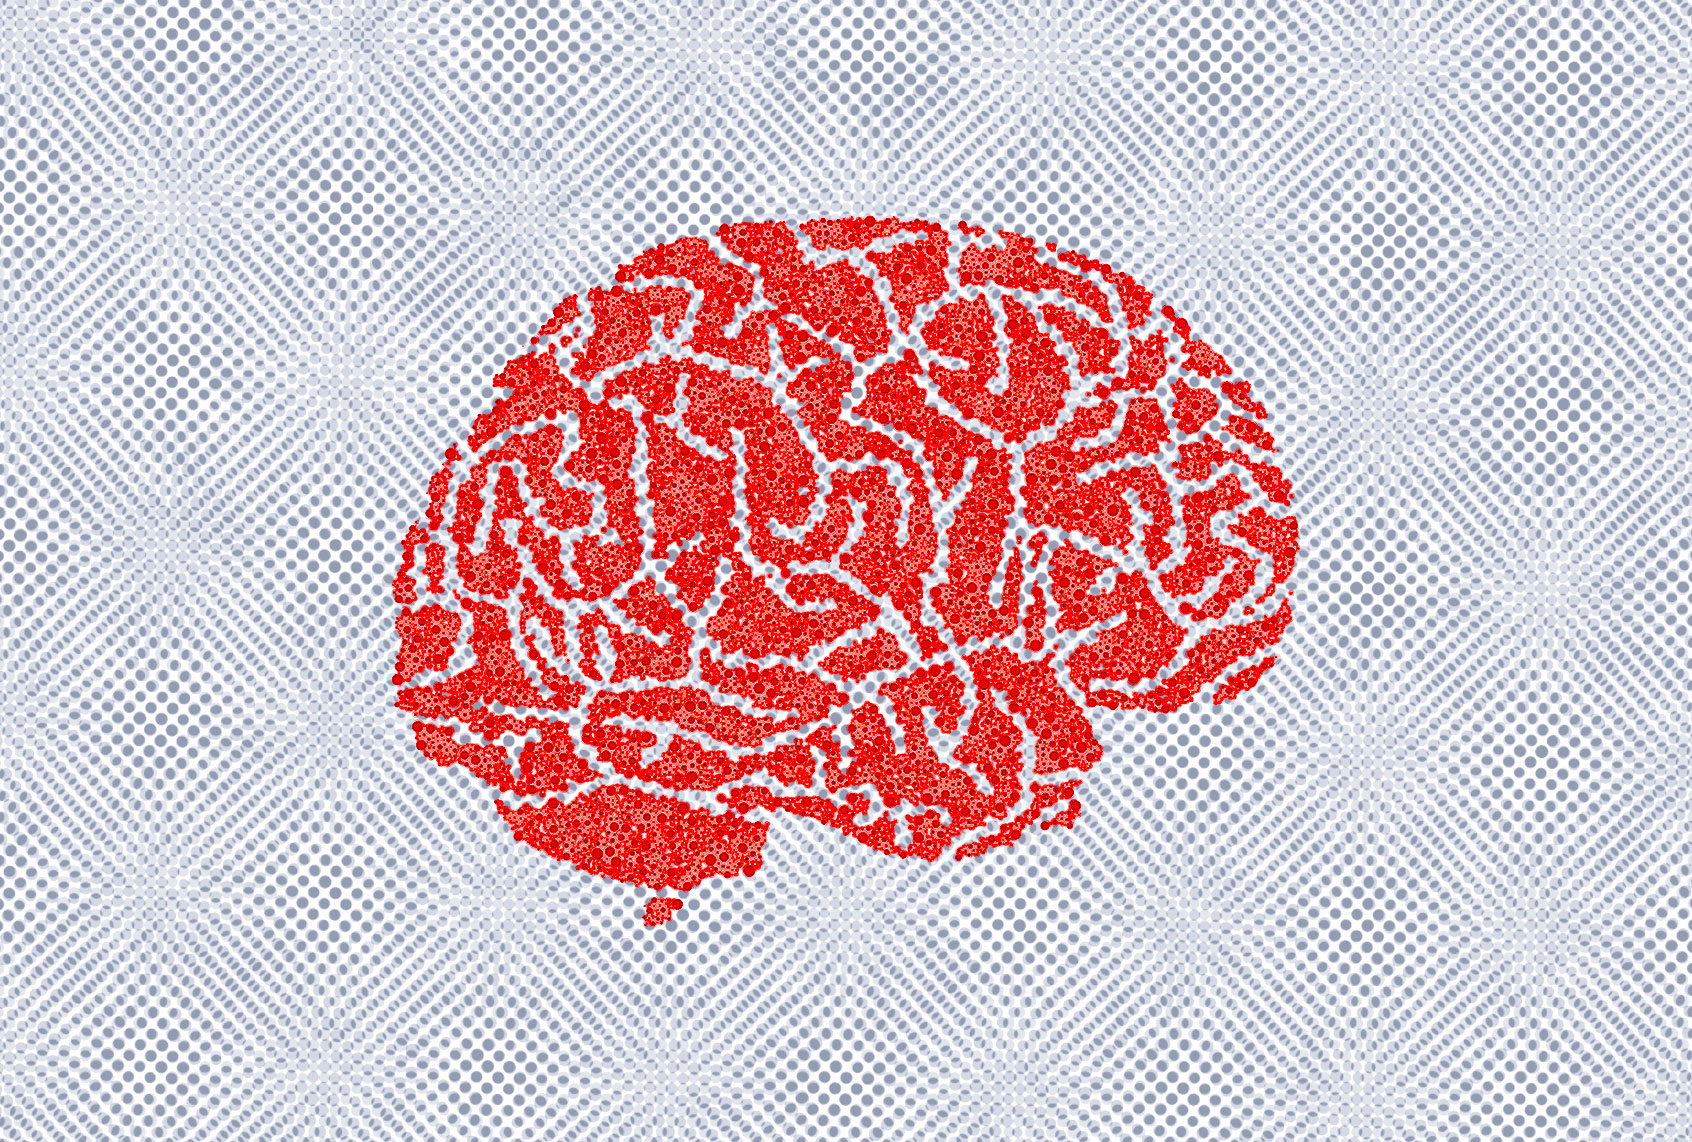 brain-static-0219211.jpg